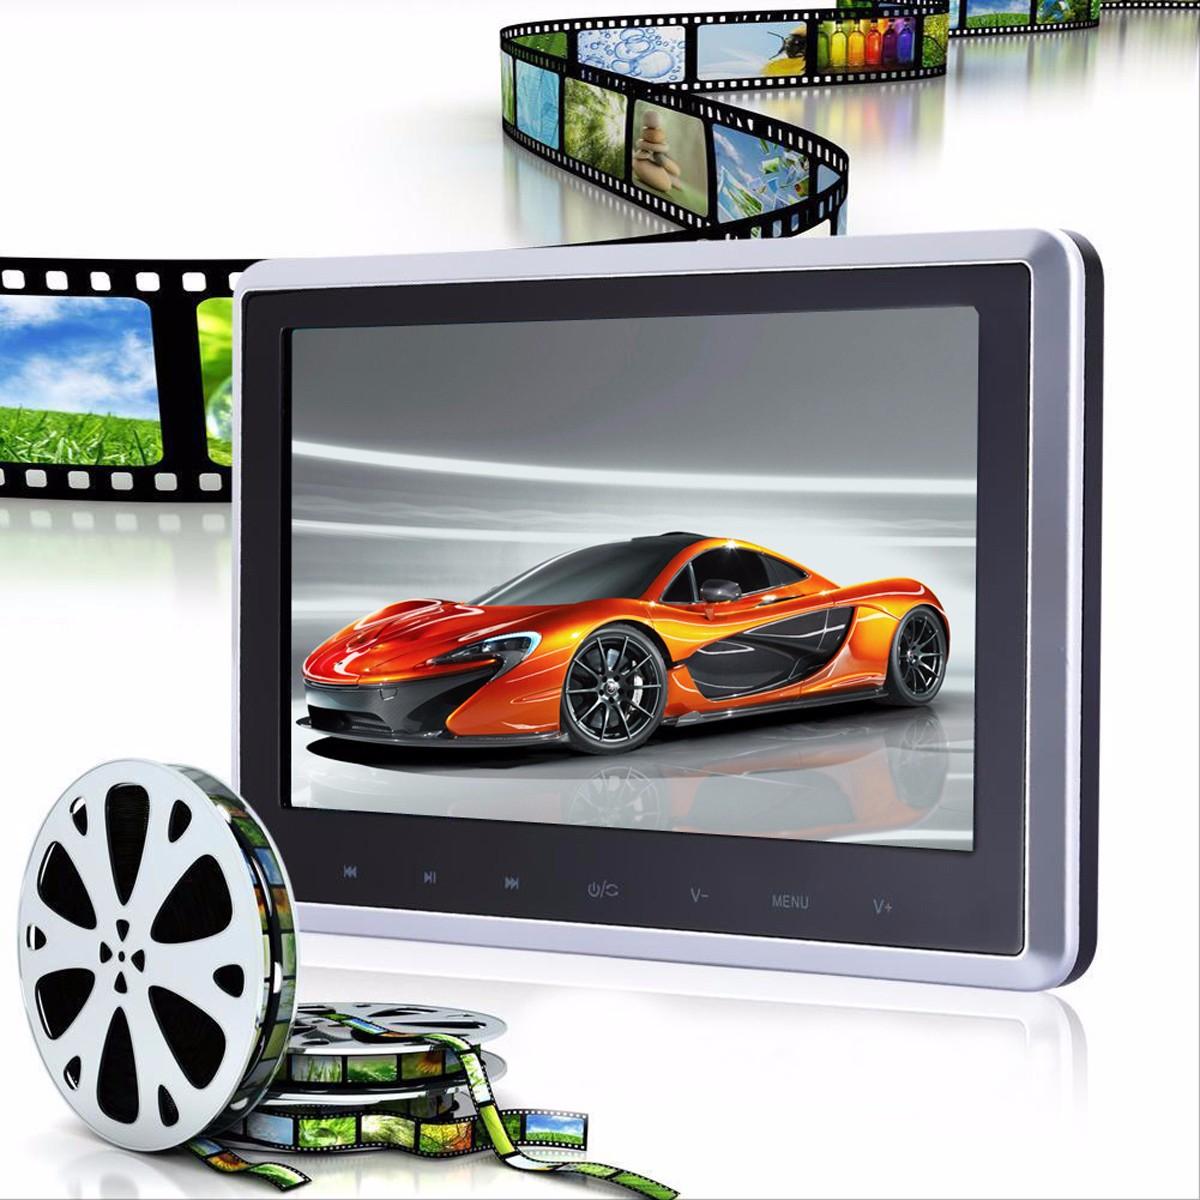 10 zoll lcd touchscreen tragbar auto kopfst tze monitor. Black Bedroom Furniture Sets. Home Design Ideas